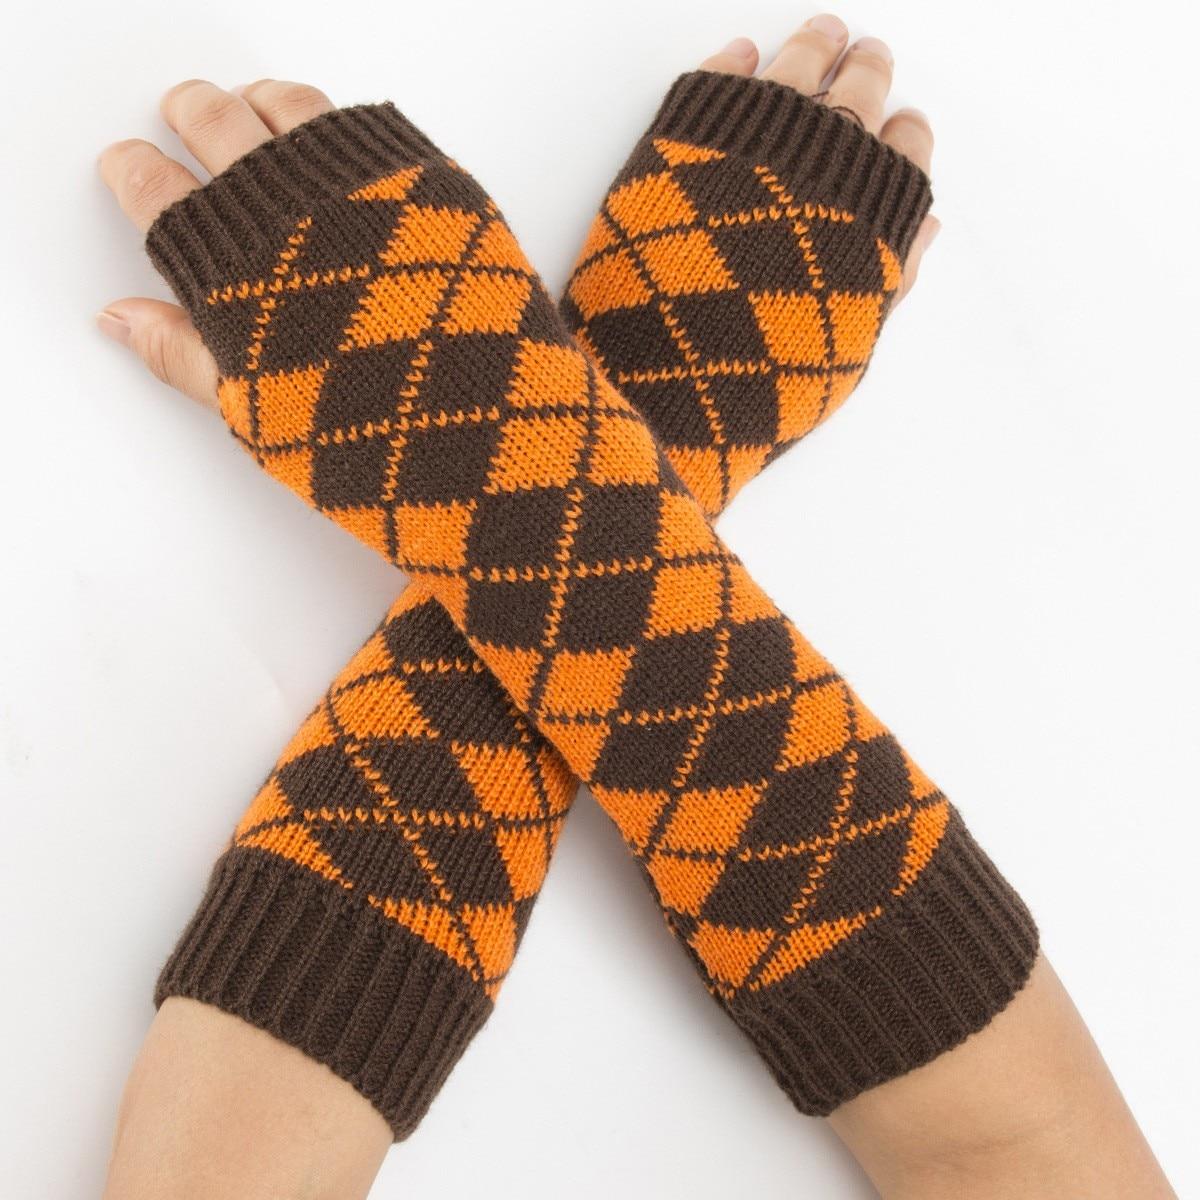 DeRuiLaDy 2019 New Fingerless Gloves For Women Knitted Winter Keep Warm Half Finger Long Gloves Mittens For Womens